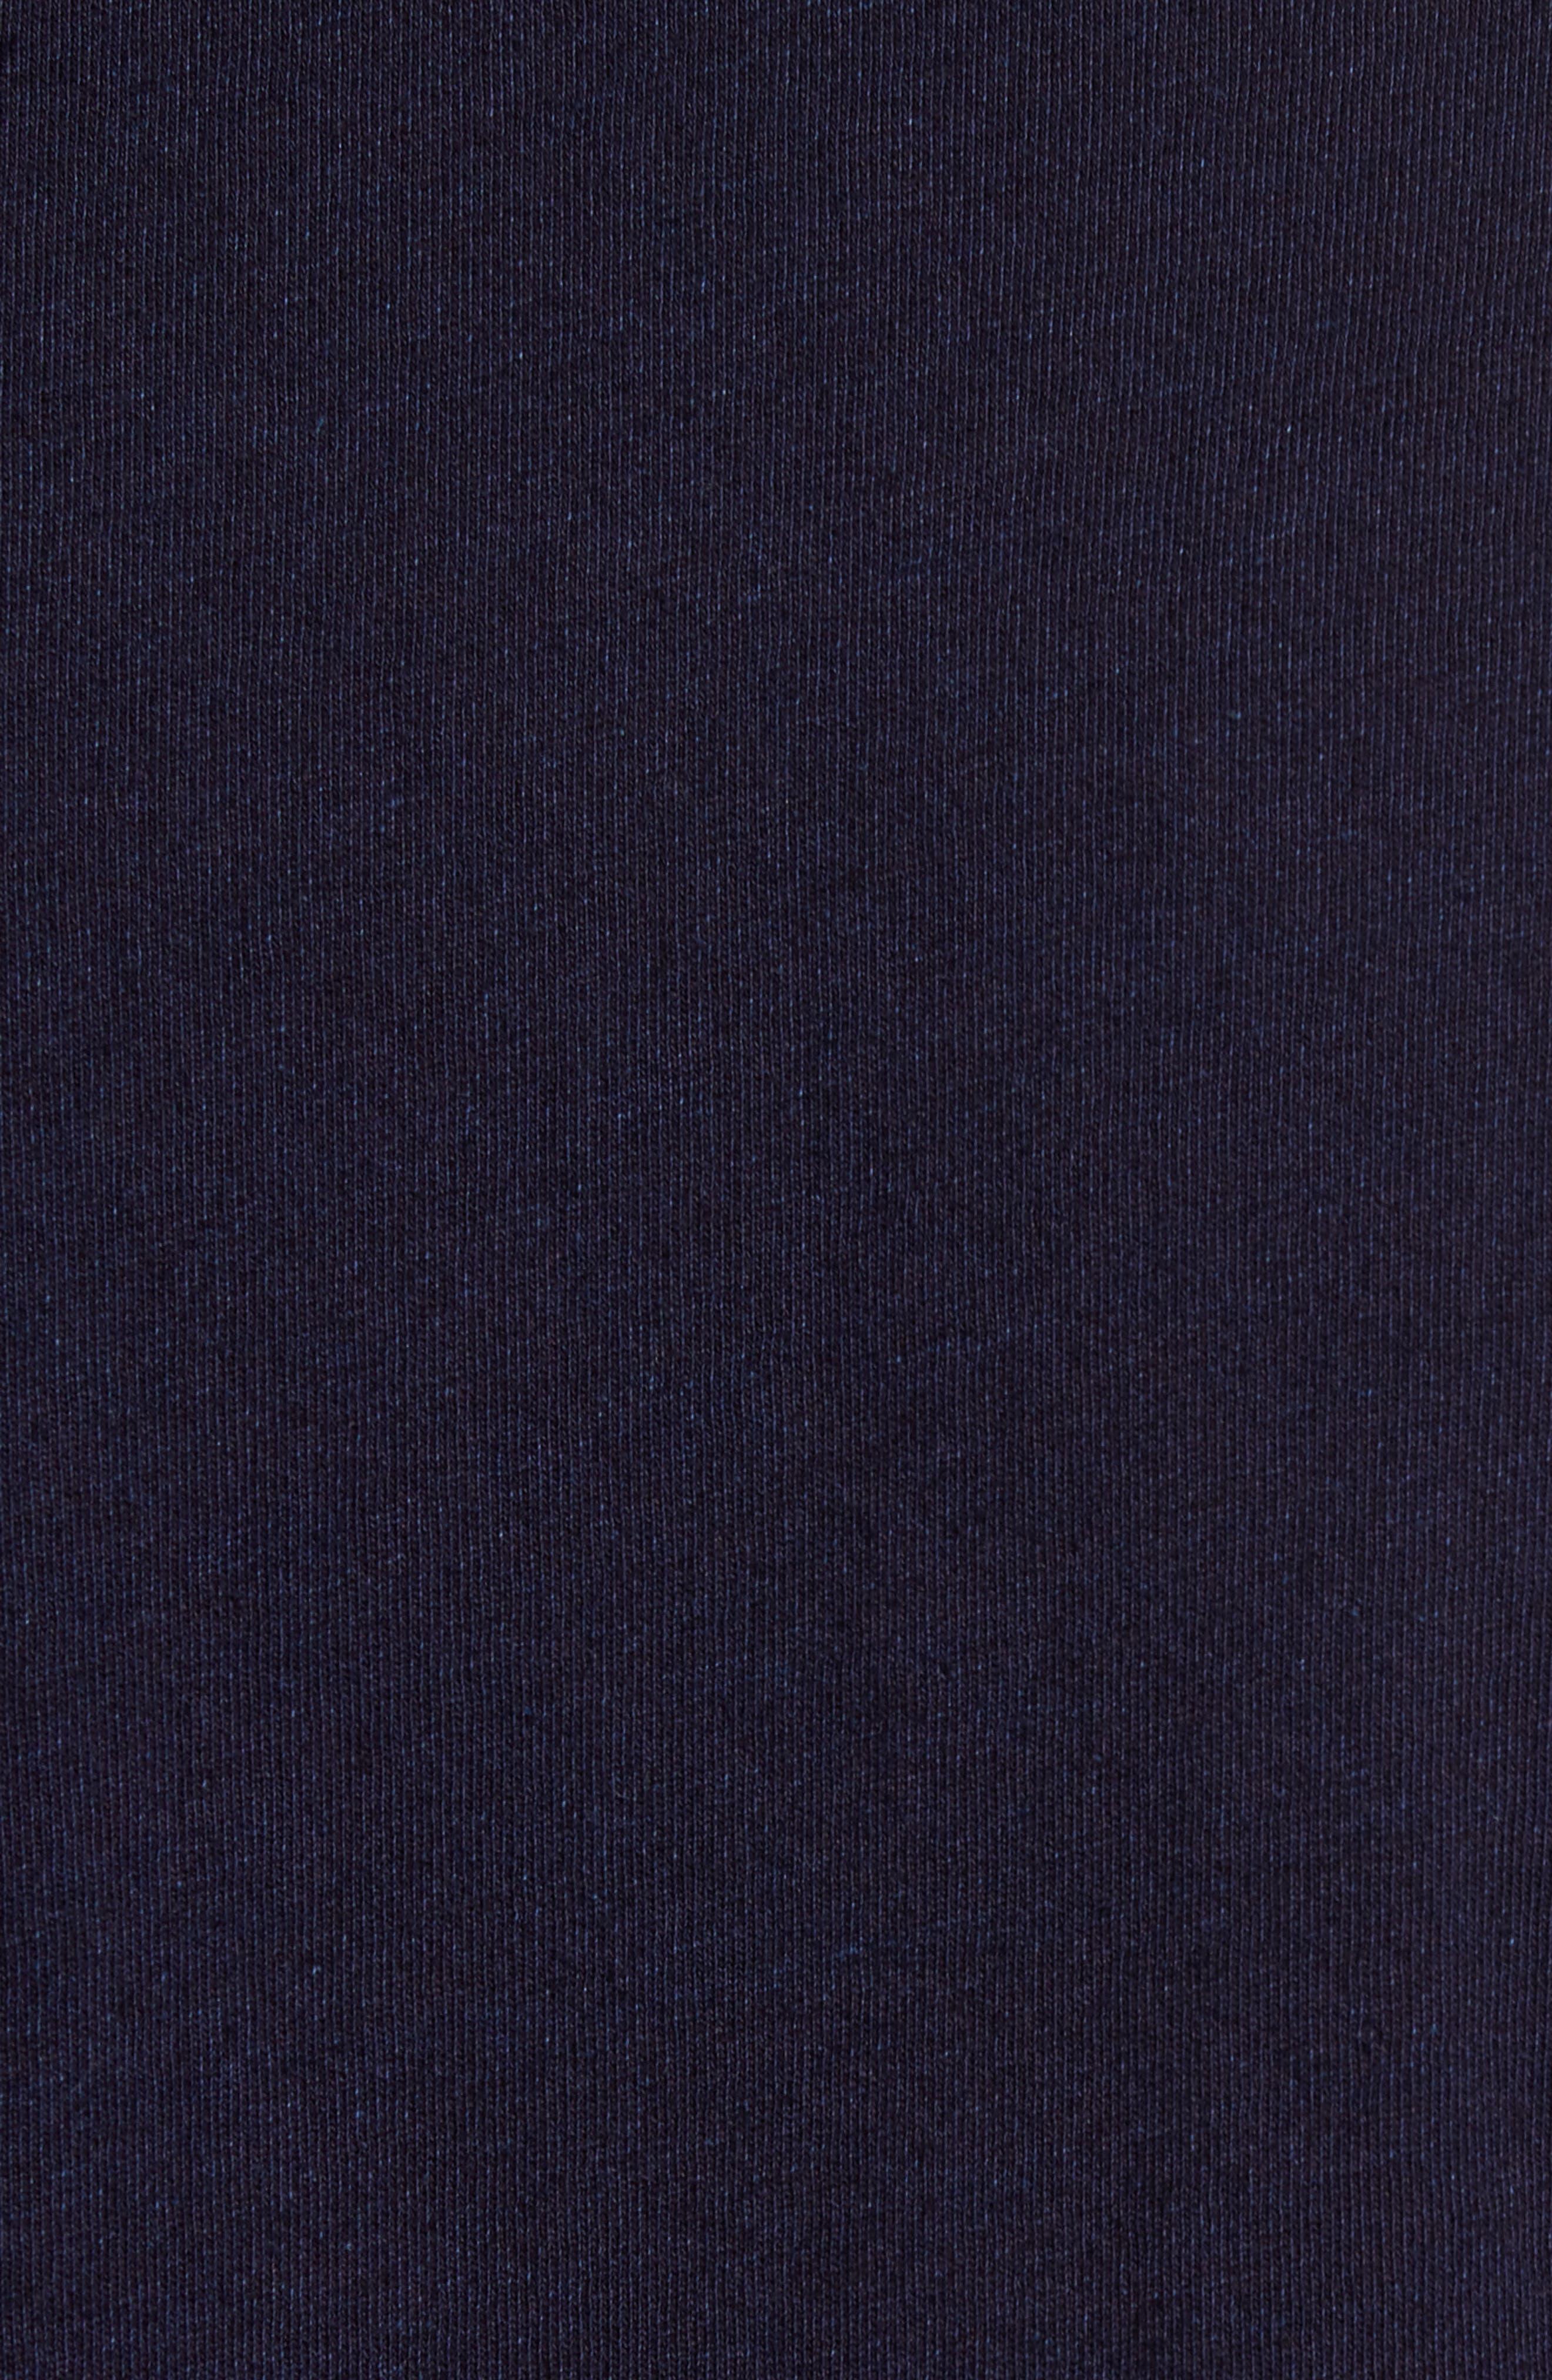 Regular Fit Chambray Trim Jersey Shirt,                             Alternate thumbnail 5, color,                             439